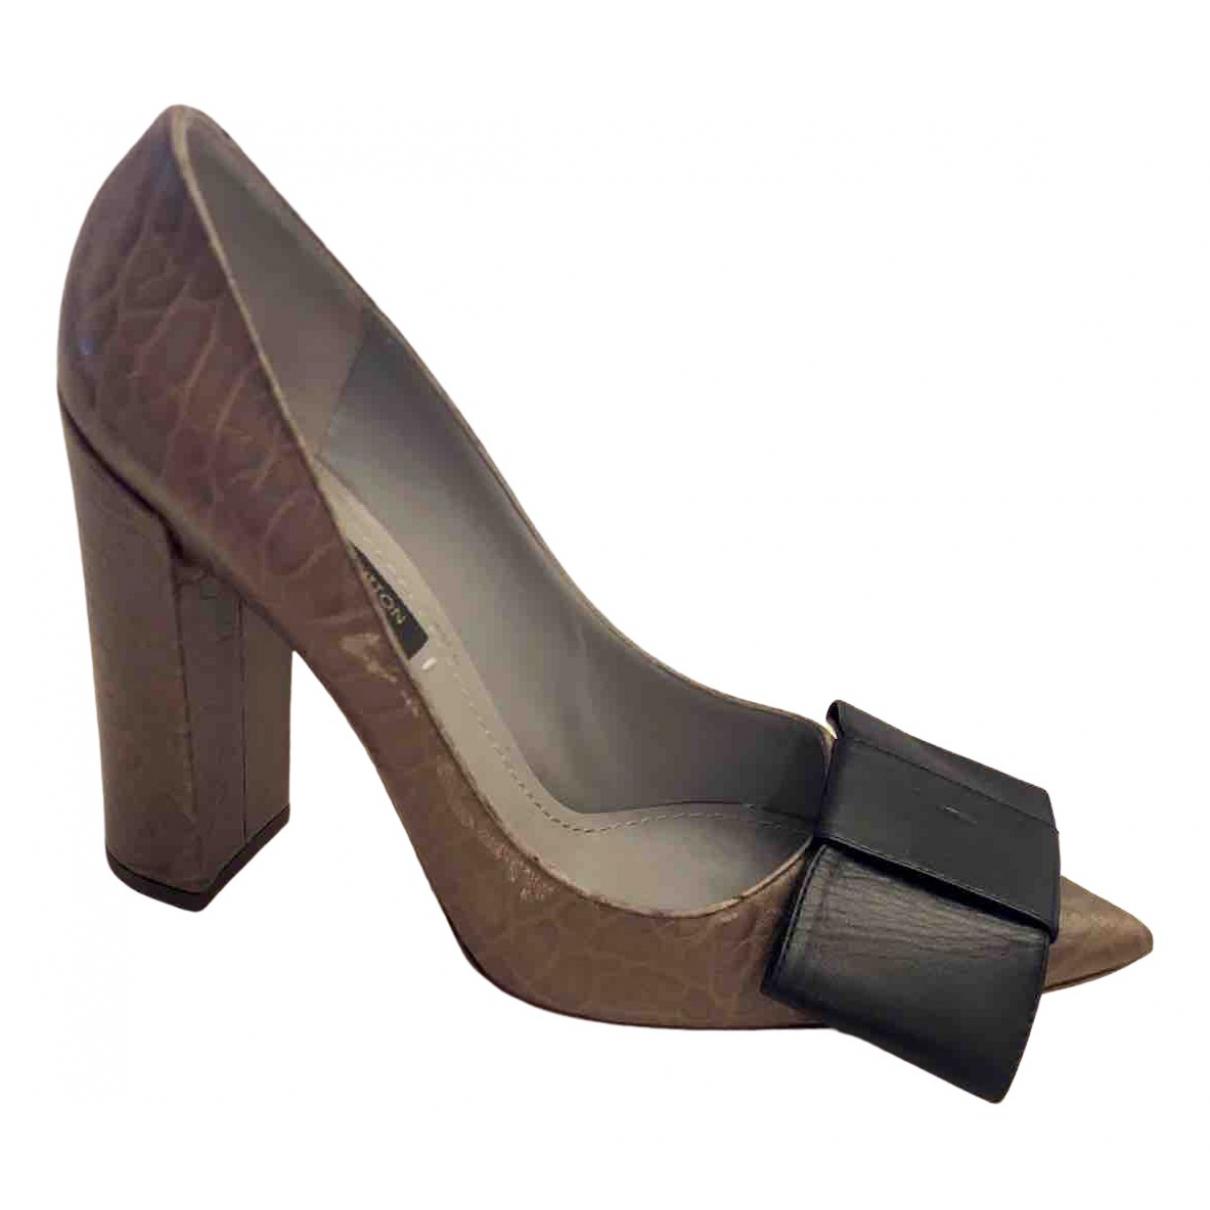 Louis Vuitton N Brown Leather Heels for Women 37 EU